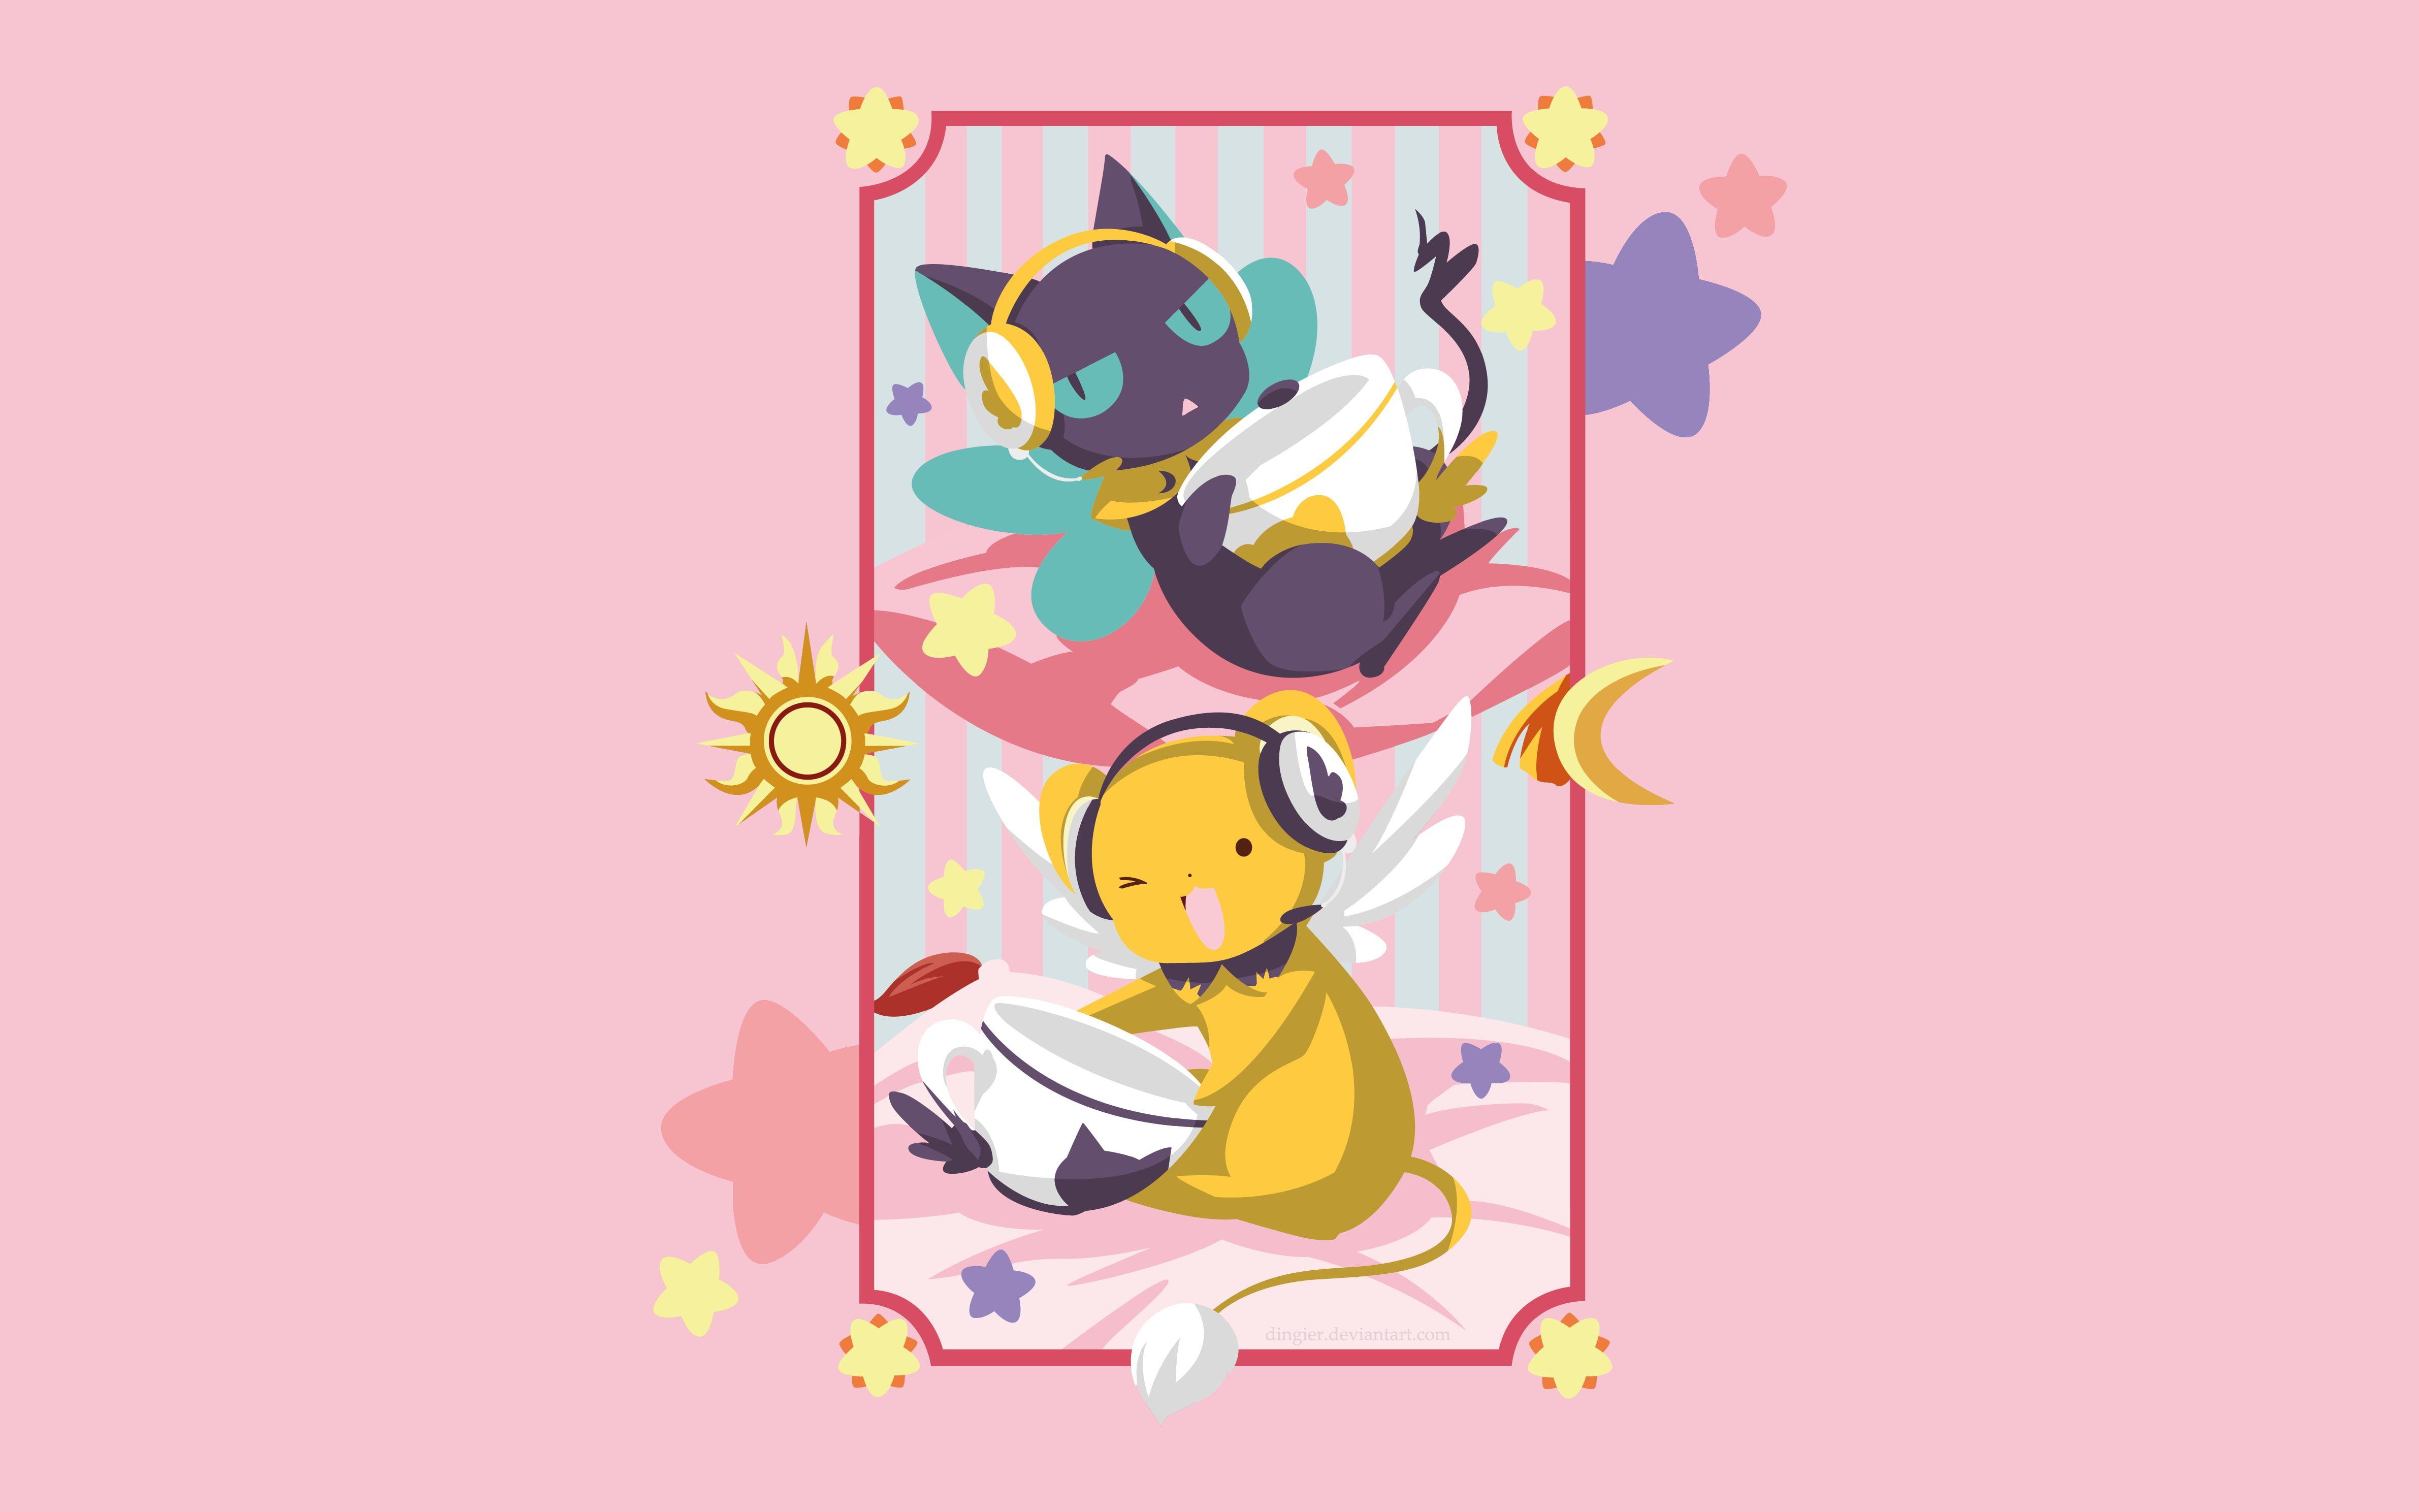 Anime Cardcaptor Sakura Cerberus Cardcaptor Sakura Spinel Sun 4k Wallpaper Hdwallpaper Desktop Character Wallpaper Cardcaptor Sakura Sakura Card